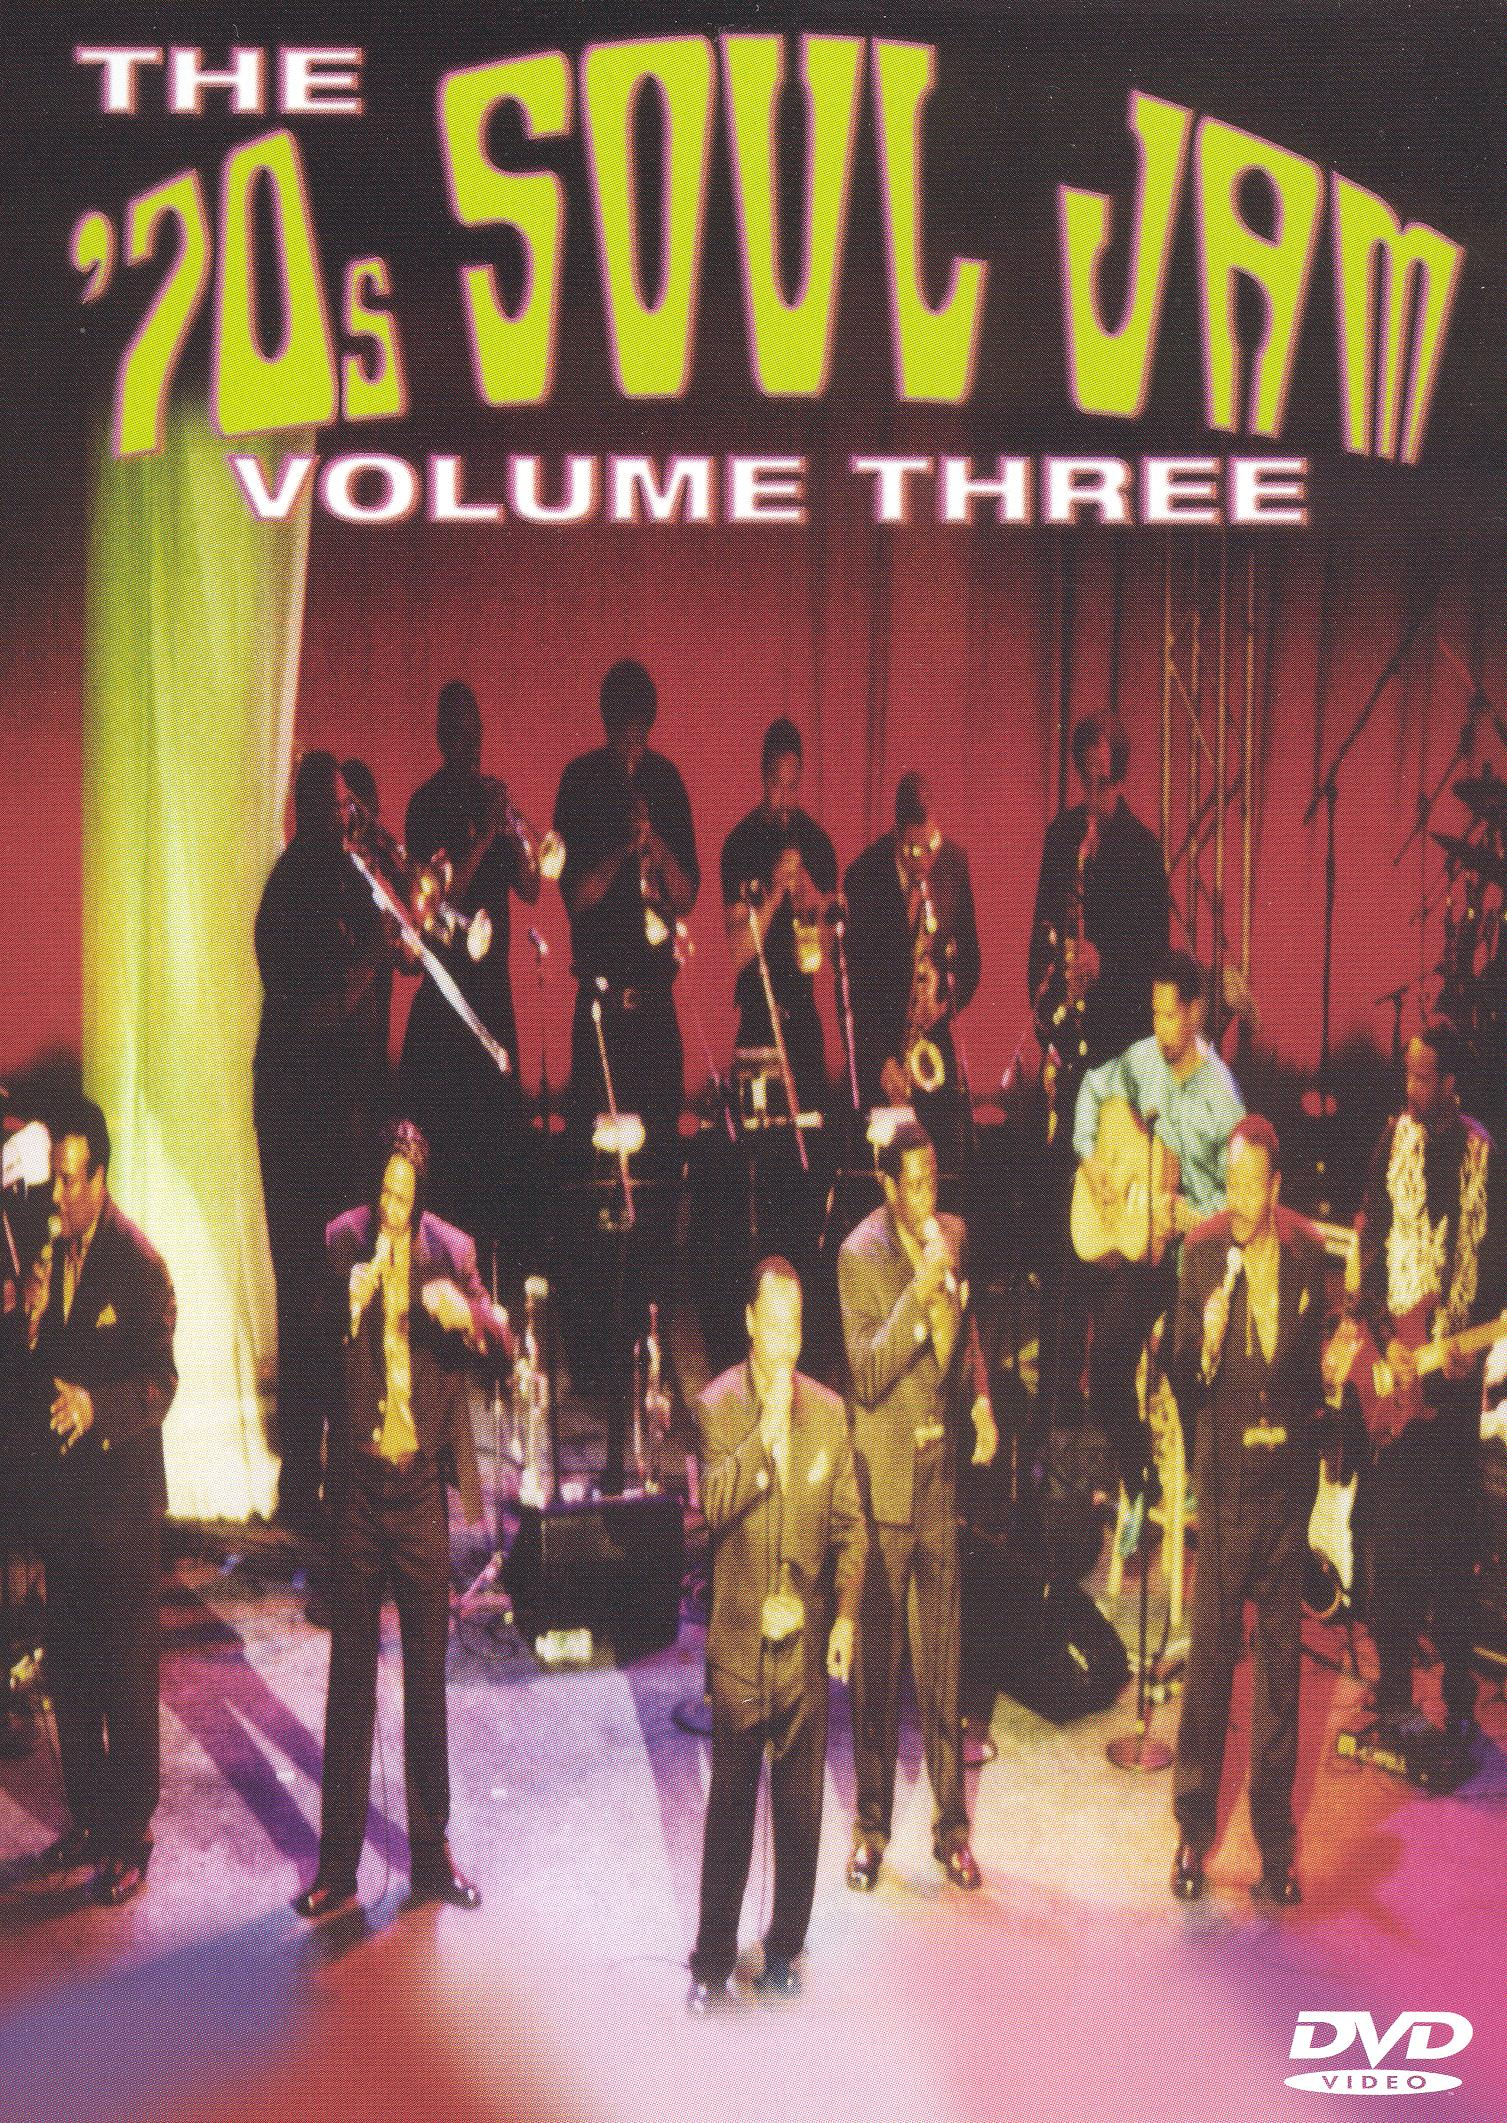 '70s Soul Jam, Vol. 3